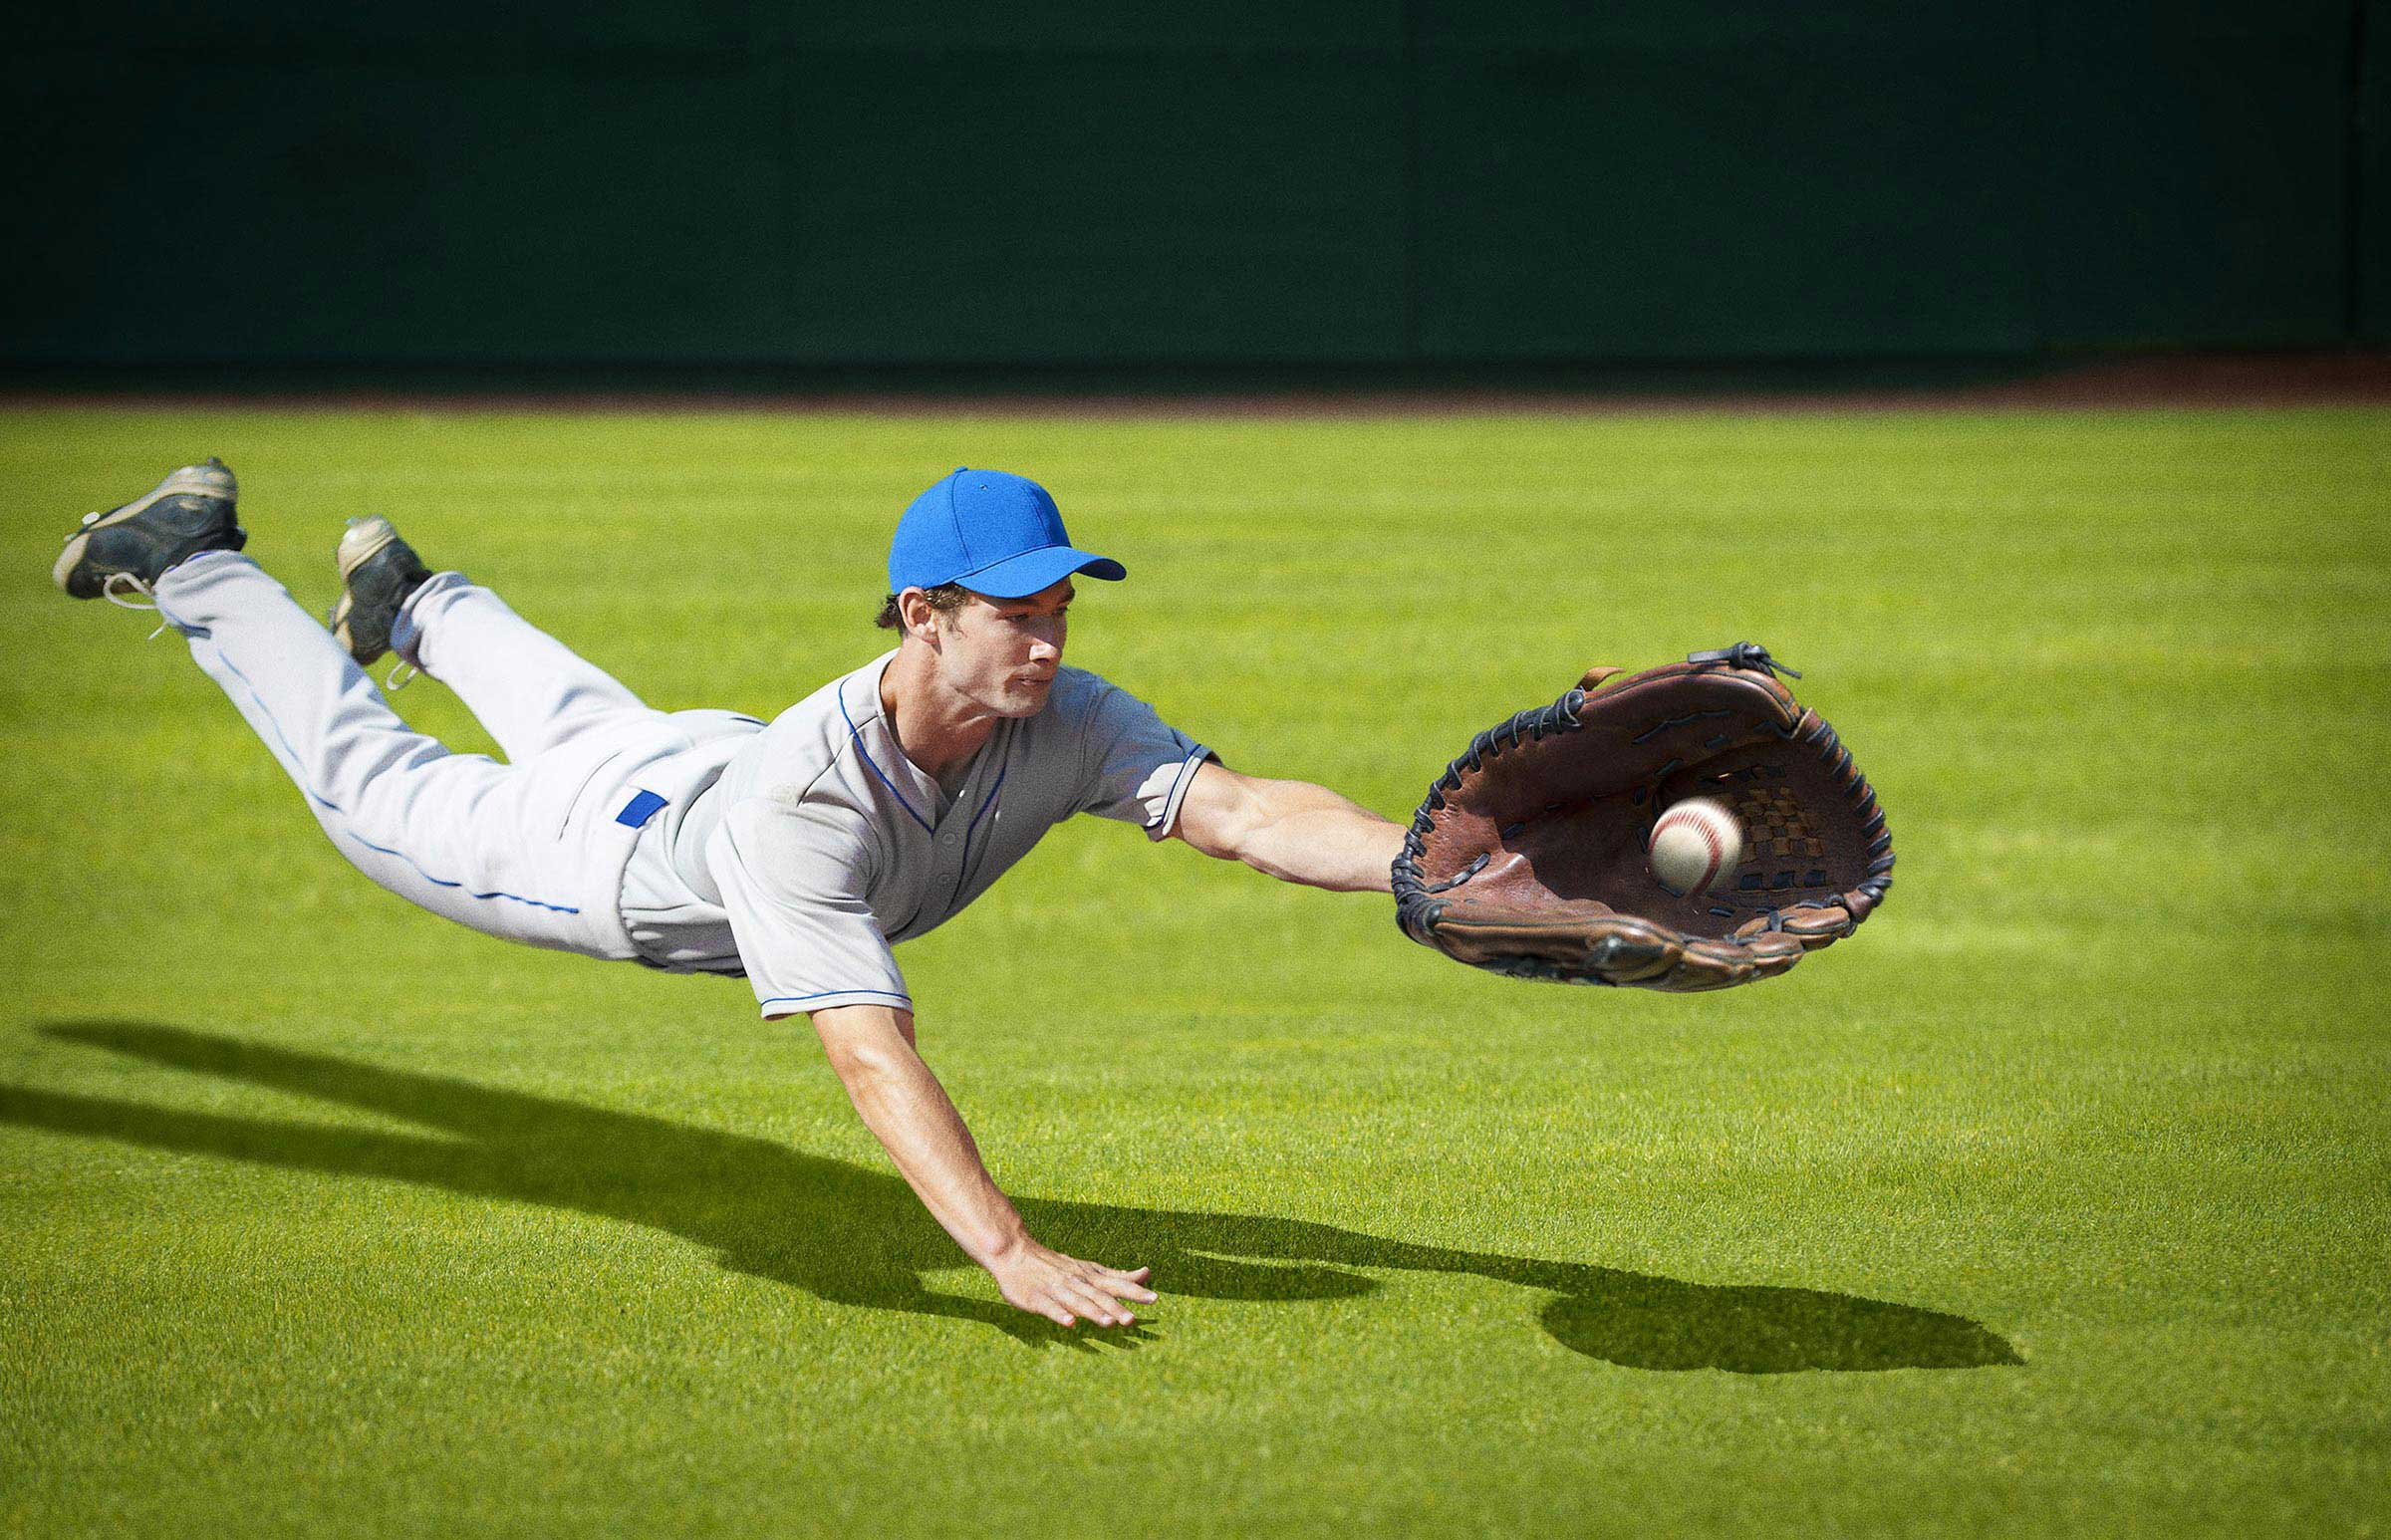 baseball-player-diving-catch.jpg